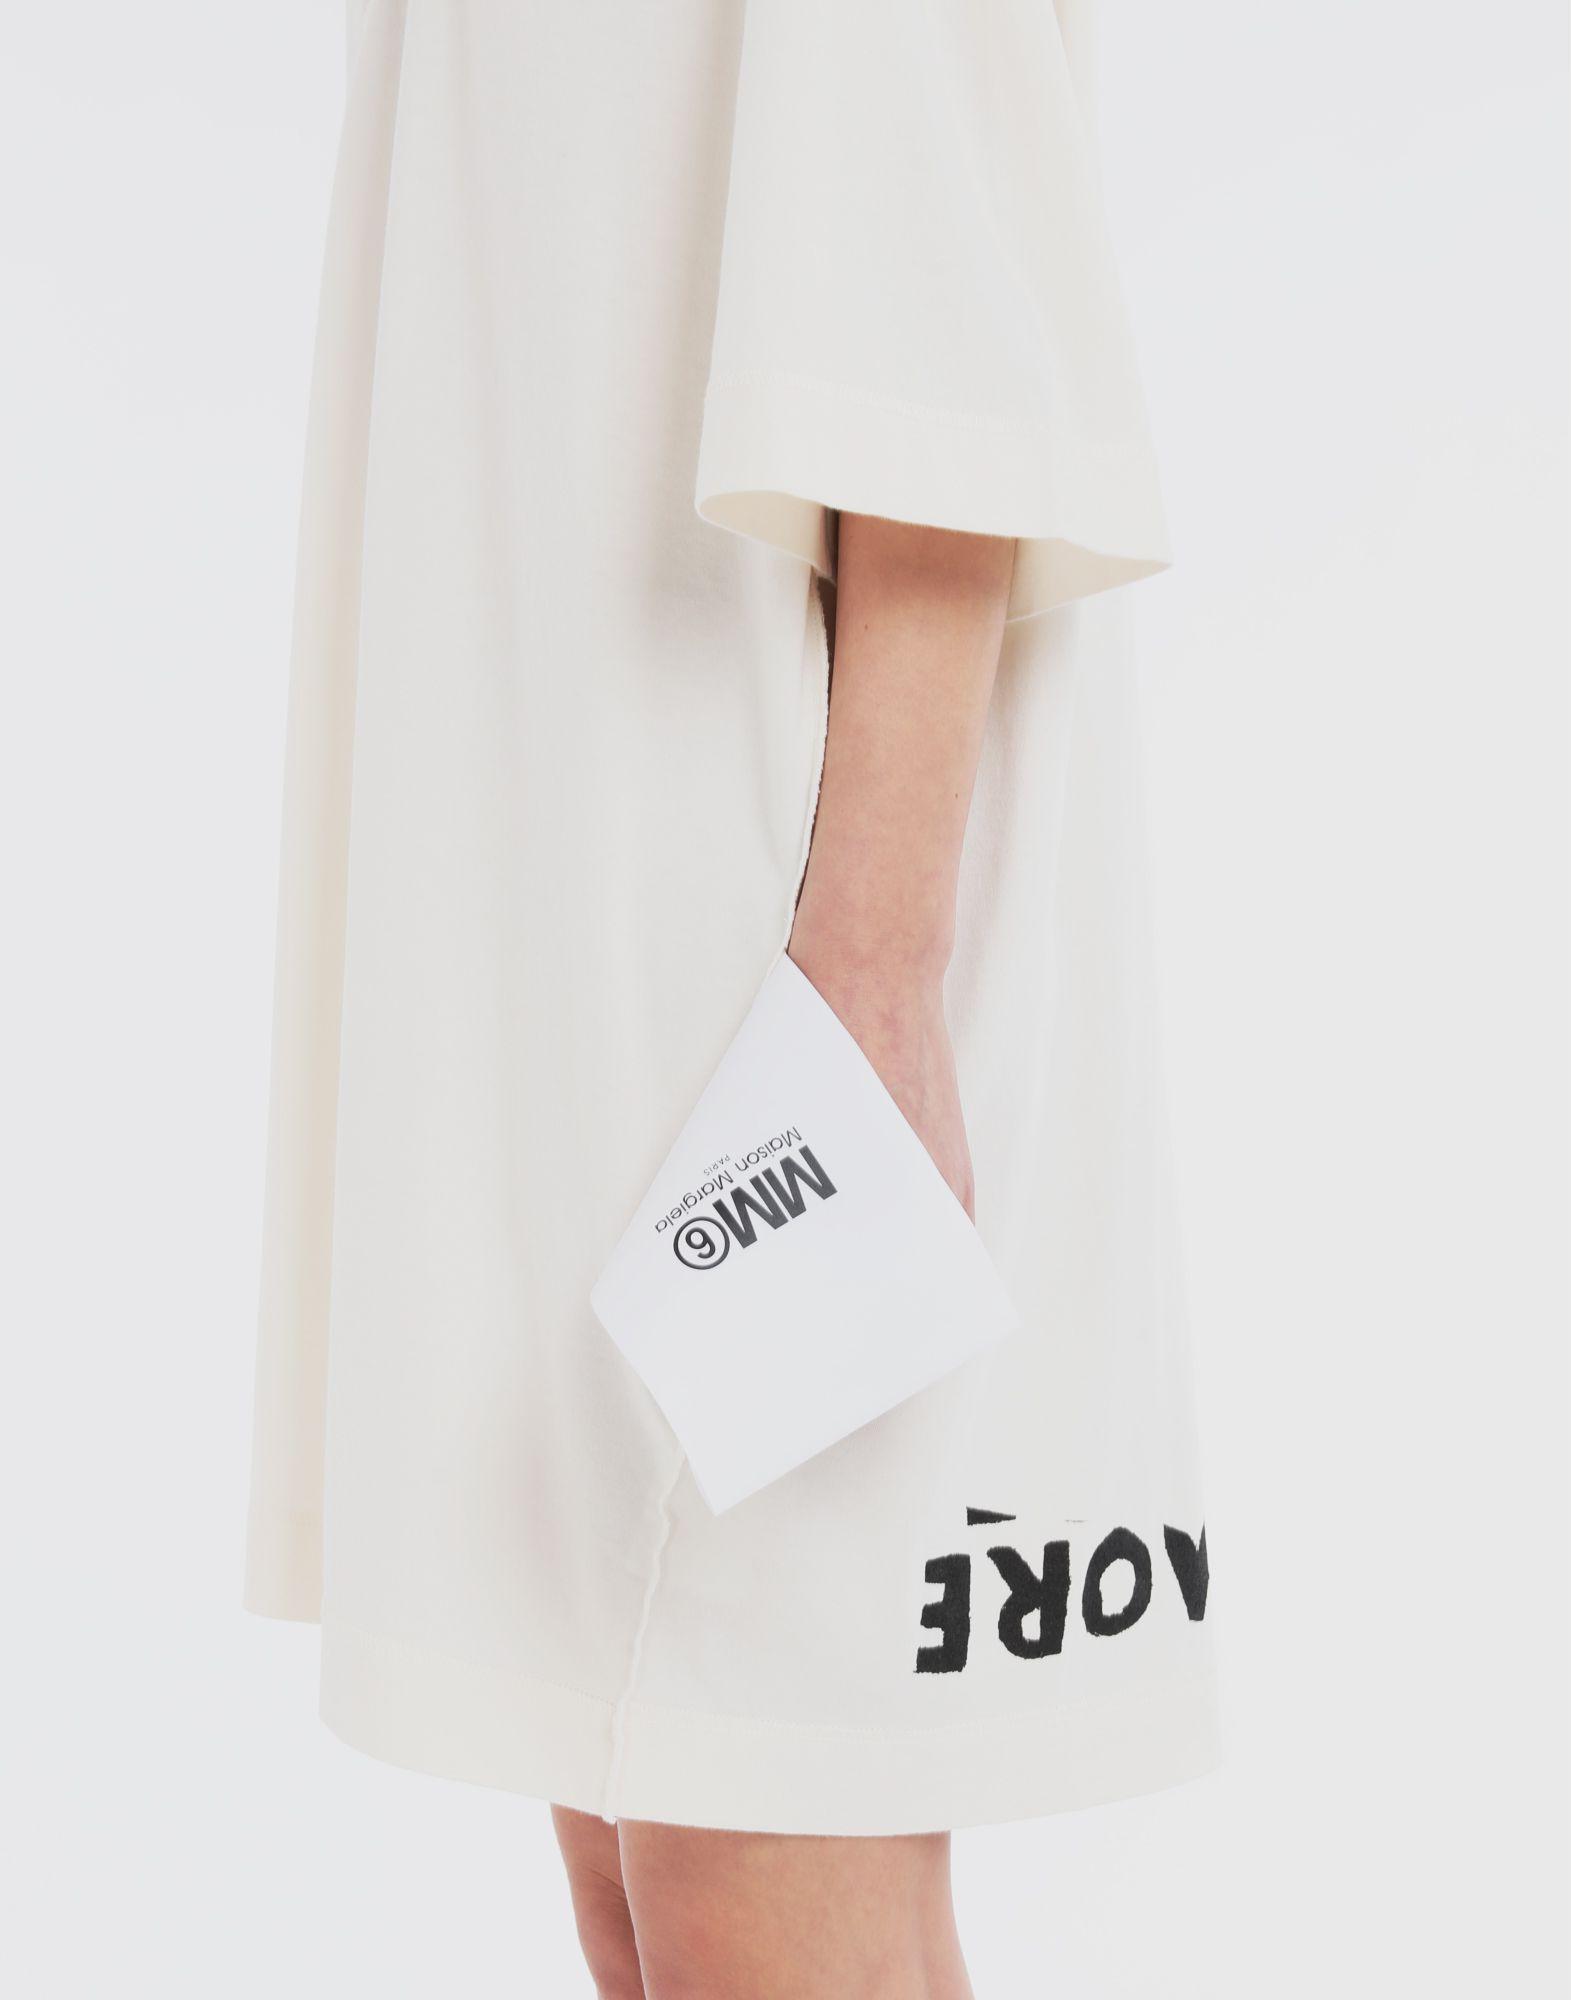 MM6 MAISON MARGIELA Charity AIDS-print dress Short dress Woman b